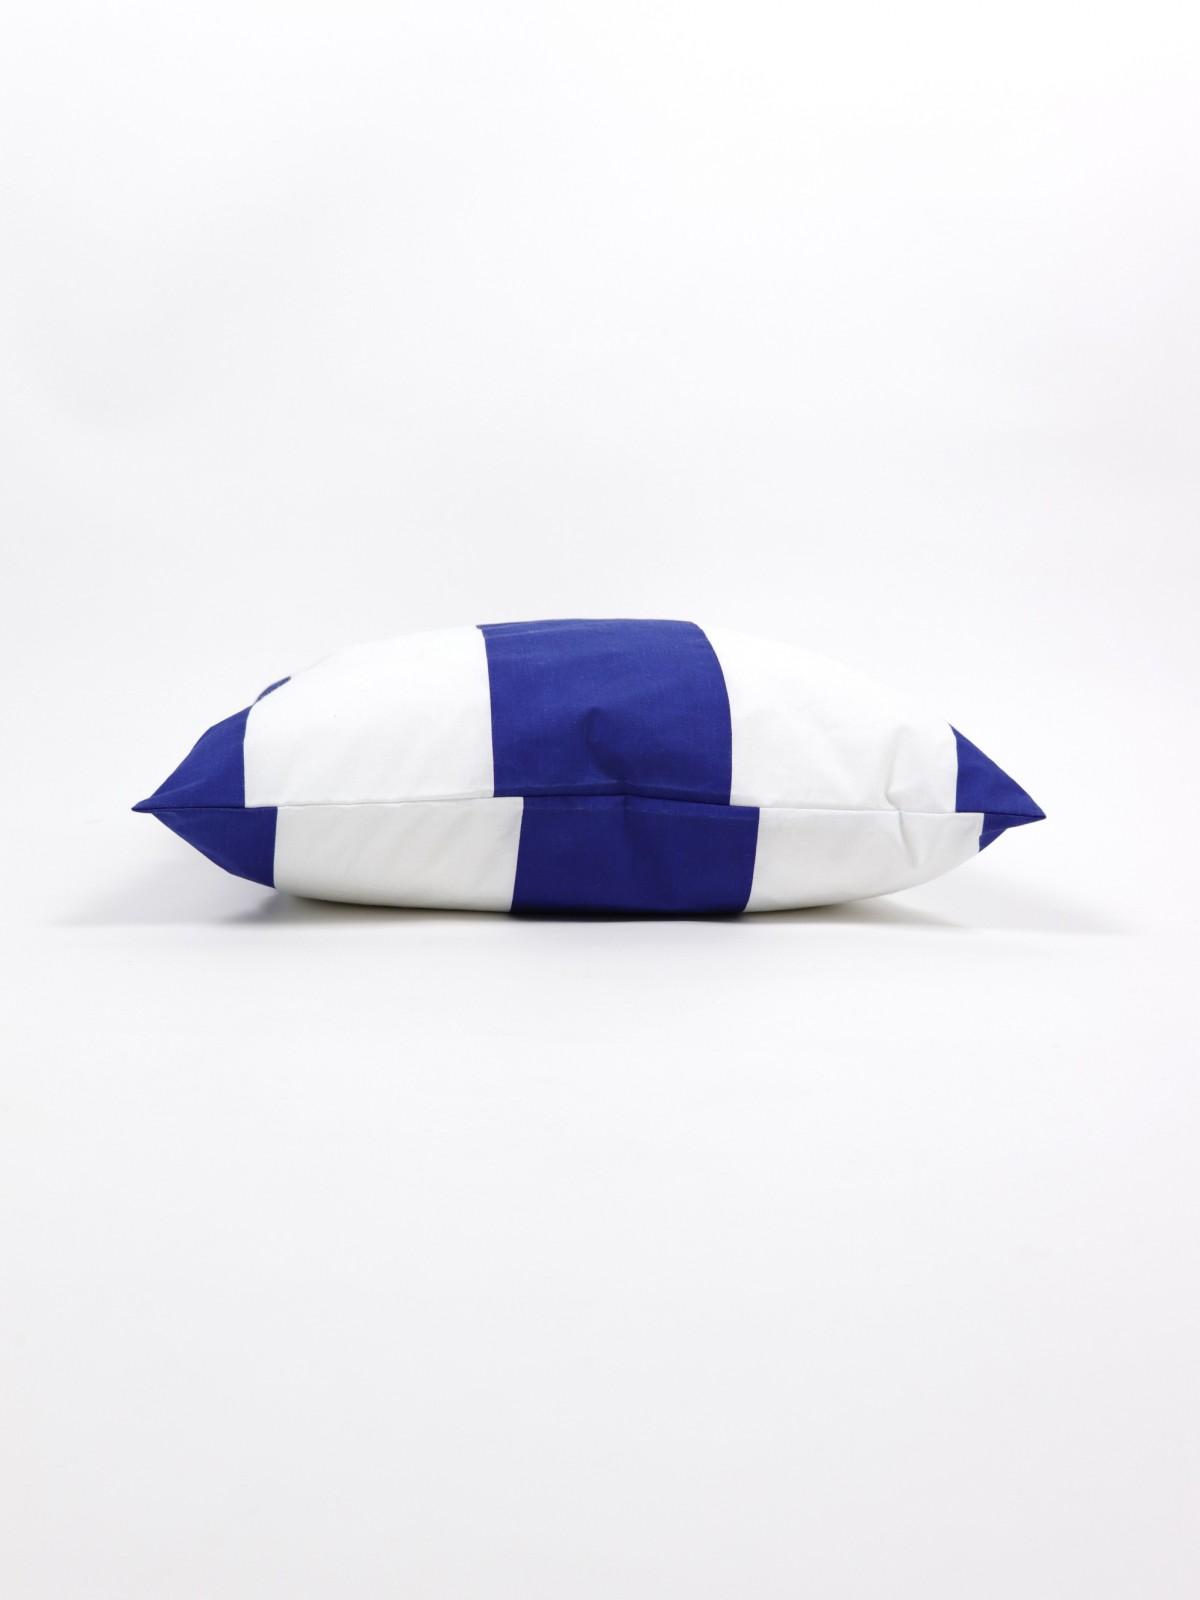 Ralph lauren,Deadstock cotton,BROWN.remake, cushion, USA